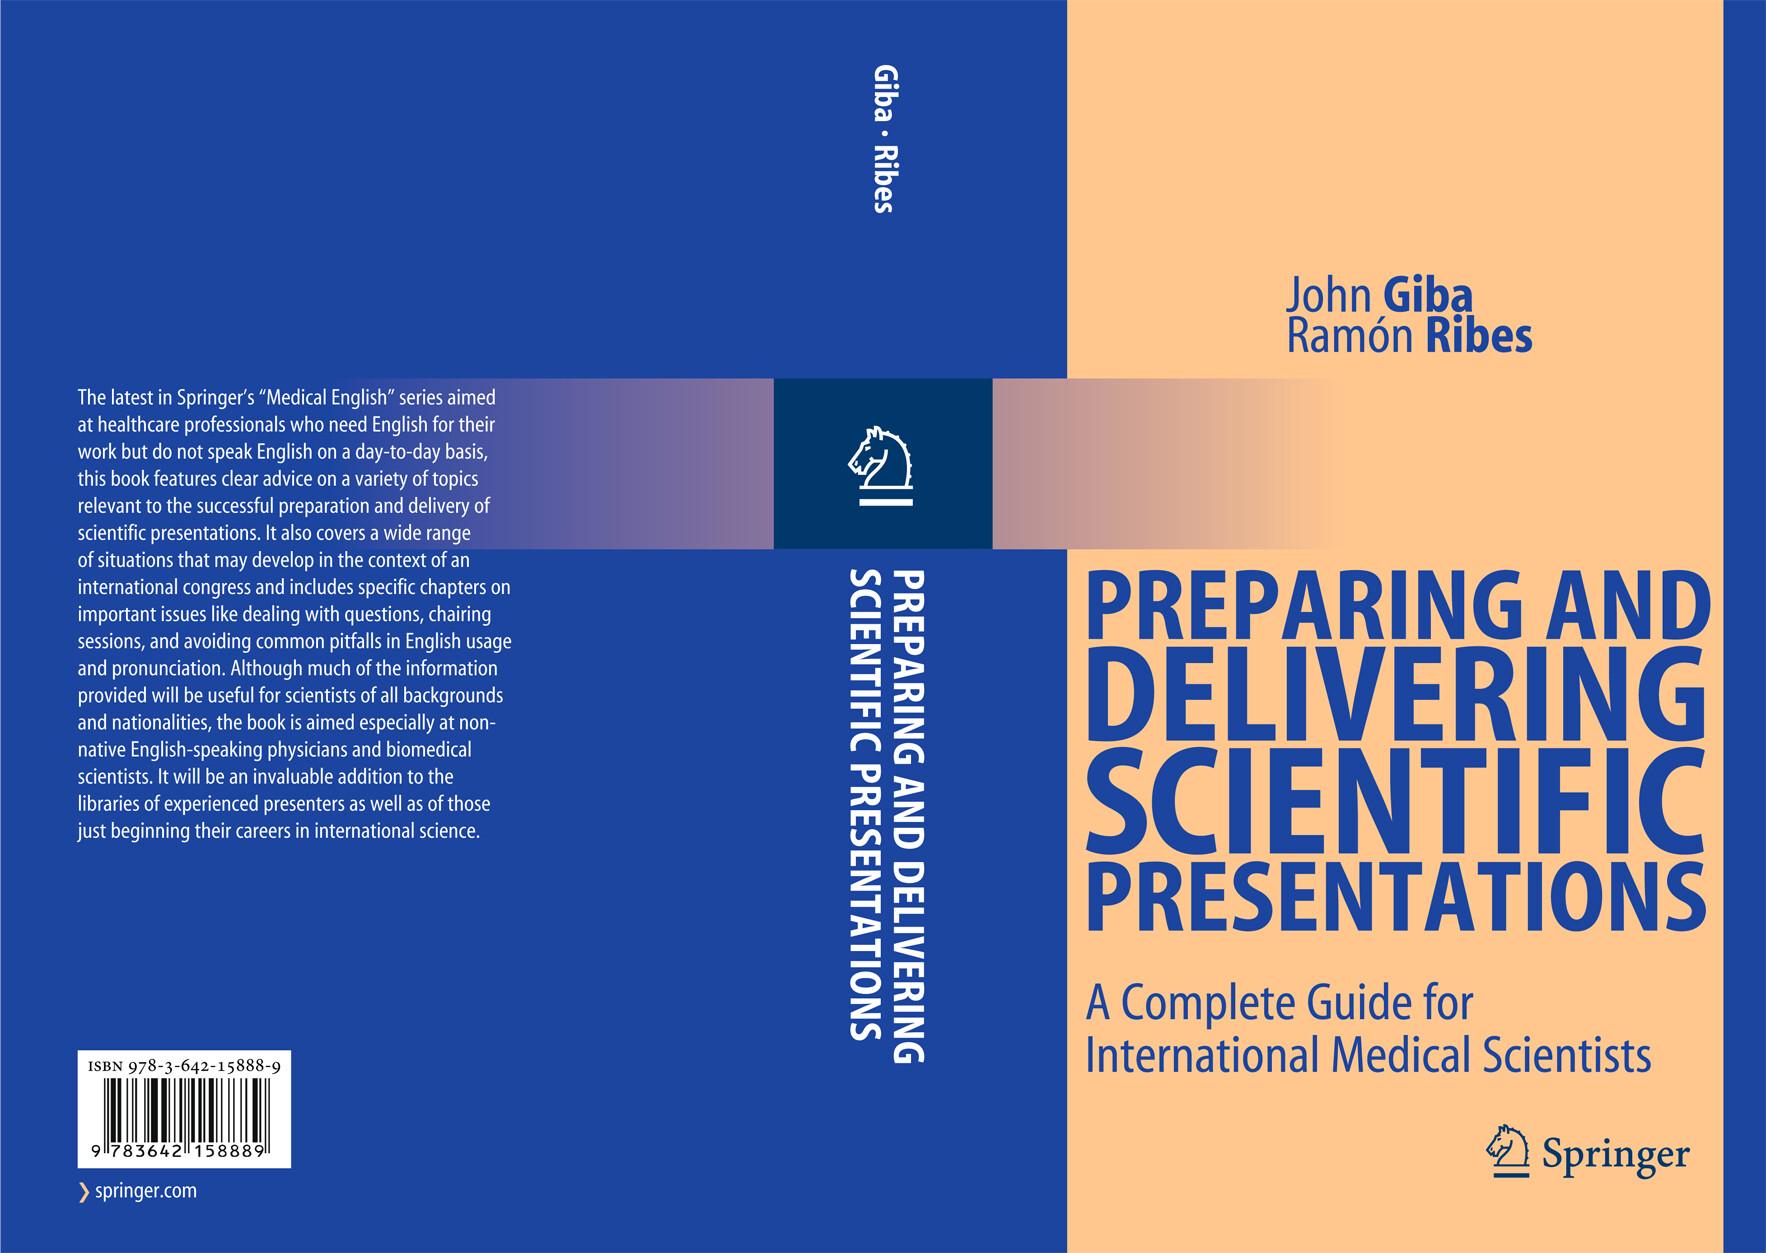 Preparing and Delivering Scientific Presentations als Buch (gebunden)